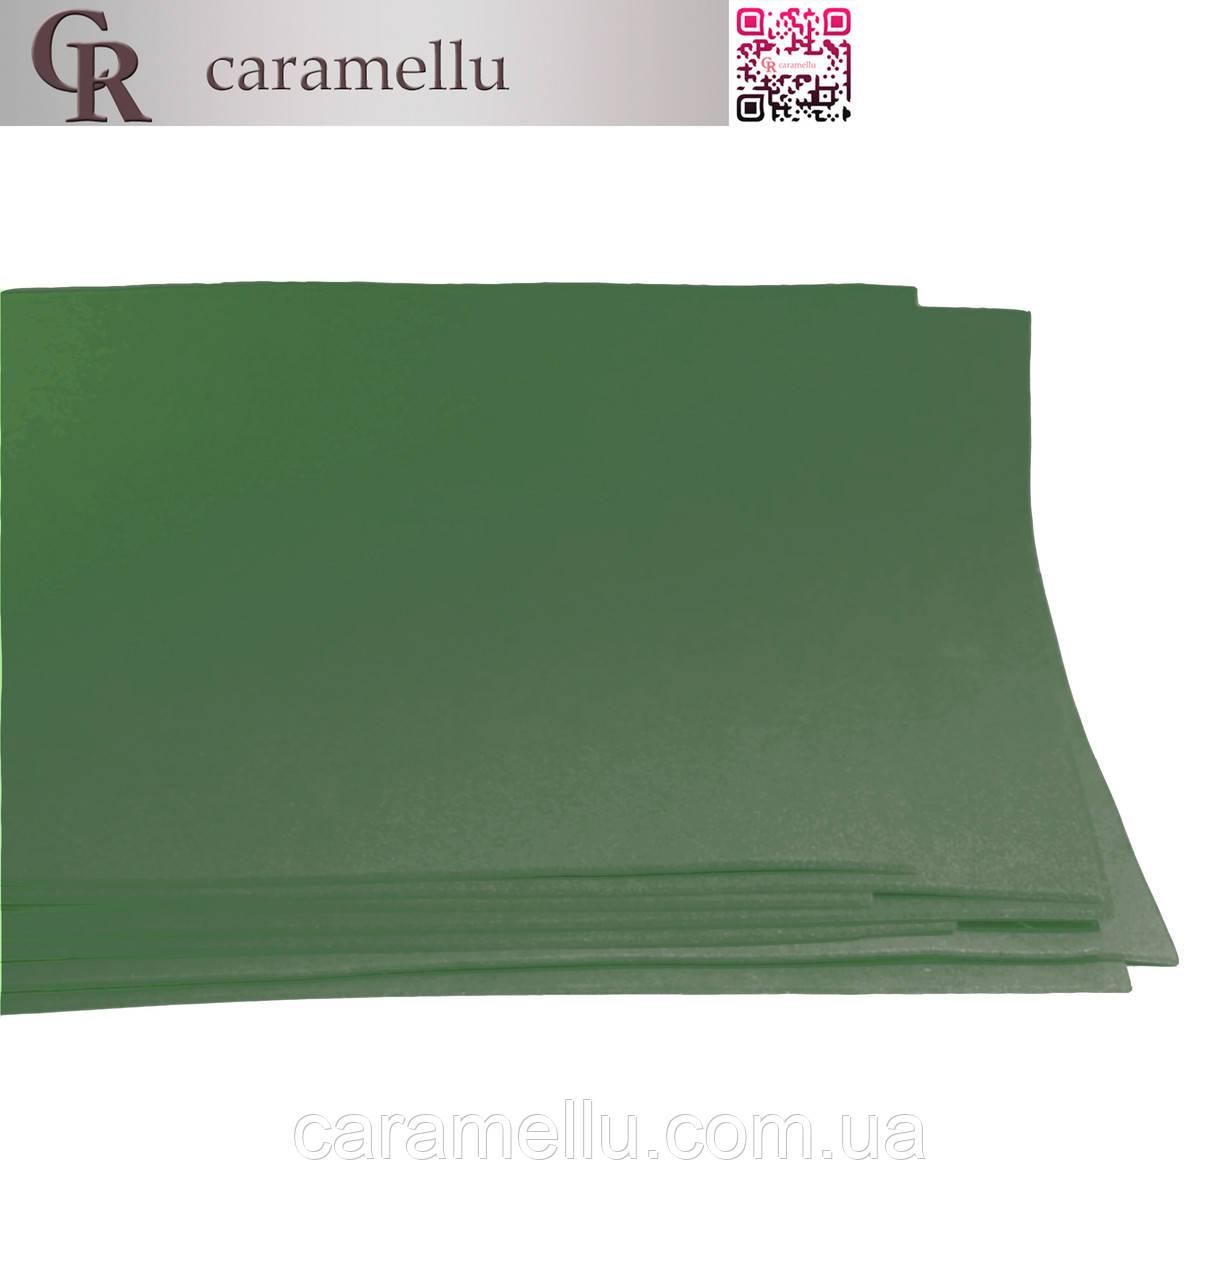 Фоамиран иранский 182, Темно-темно зеленый, 1мм, 20х30см А4